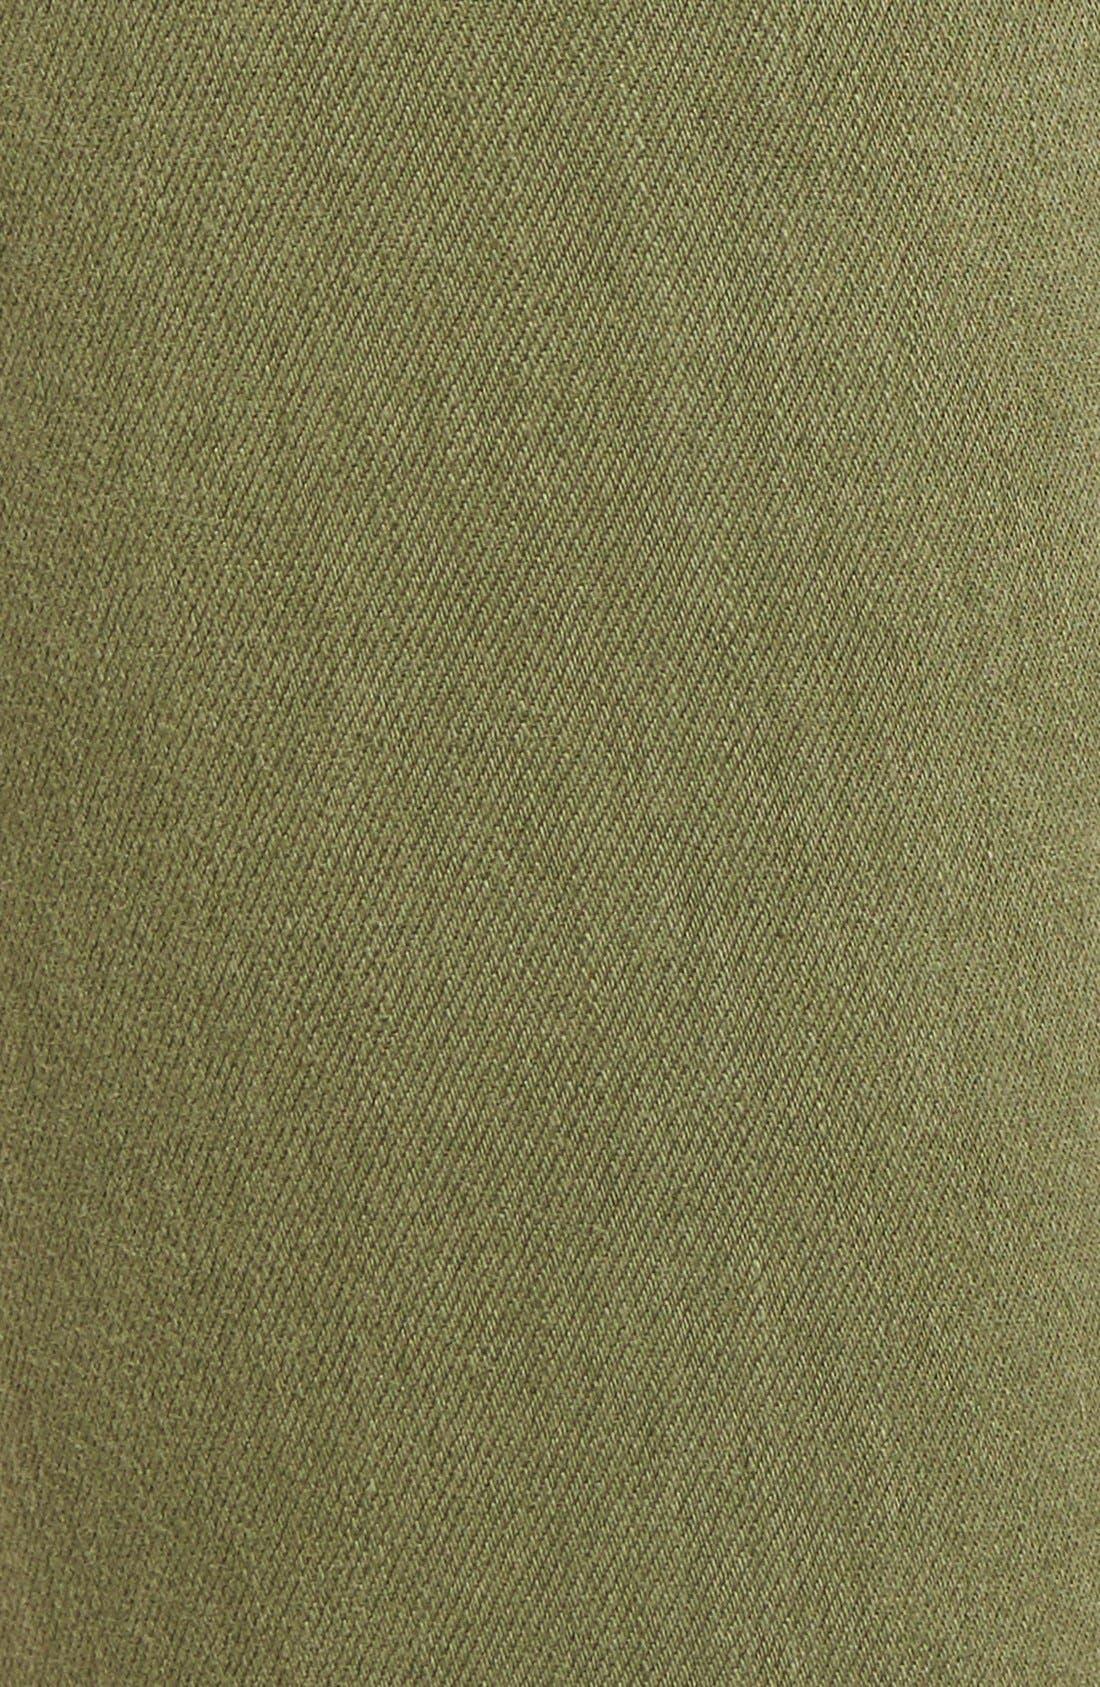 Alternate Image 5  - Current/Elliott 'The Stiletto' Crop Skinny Jeans